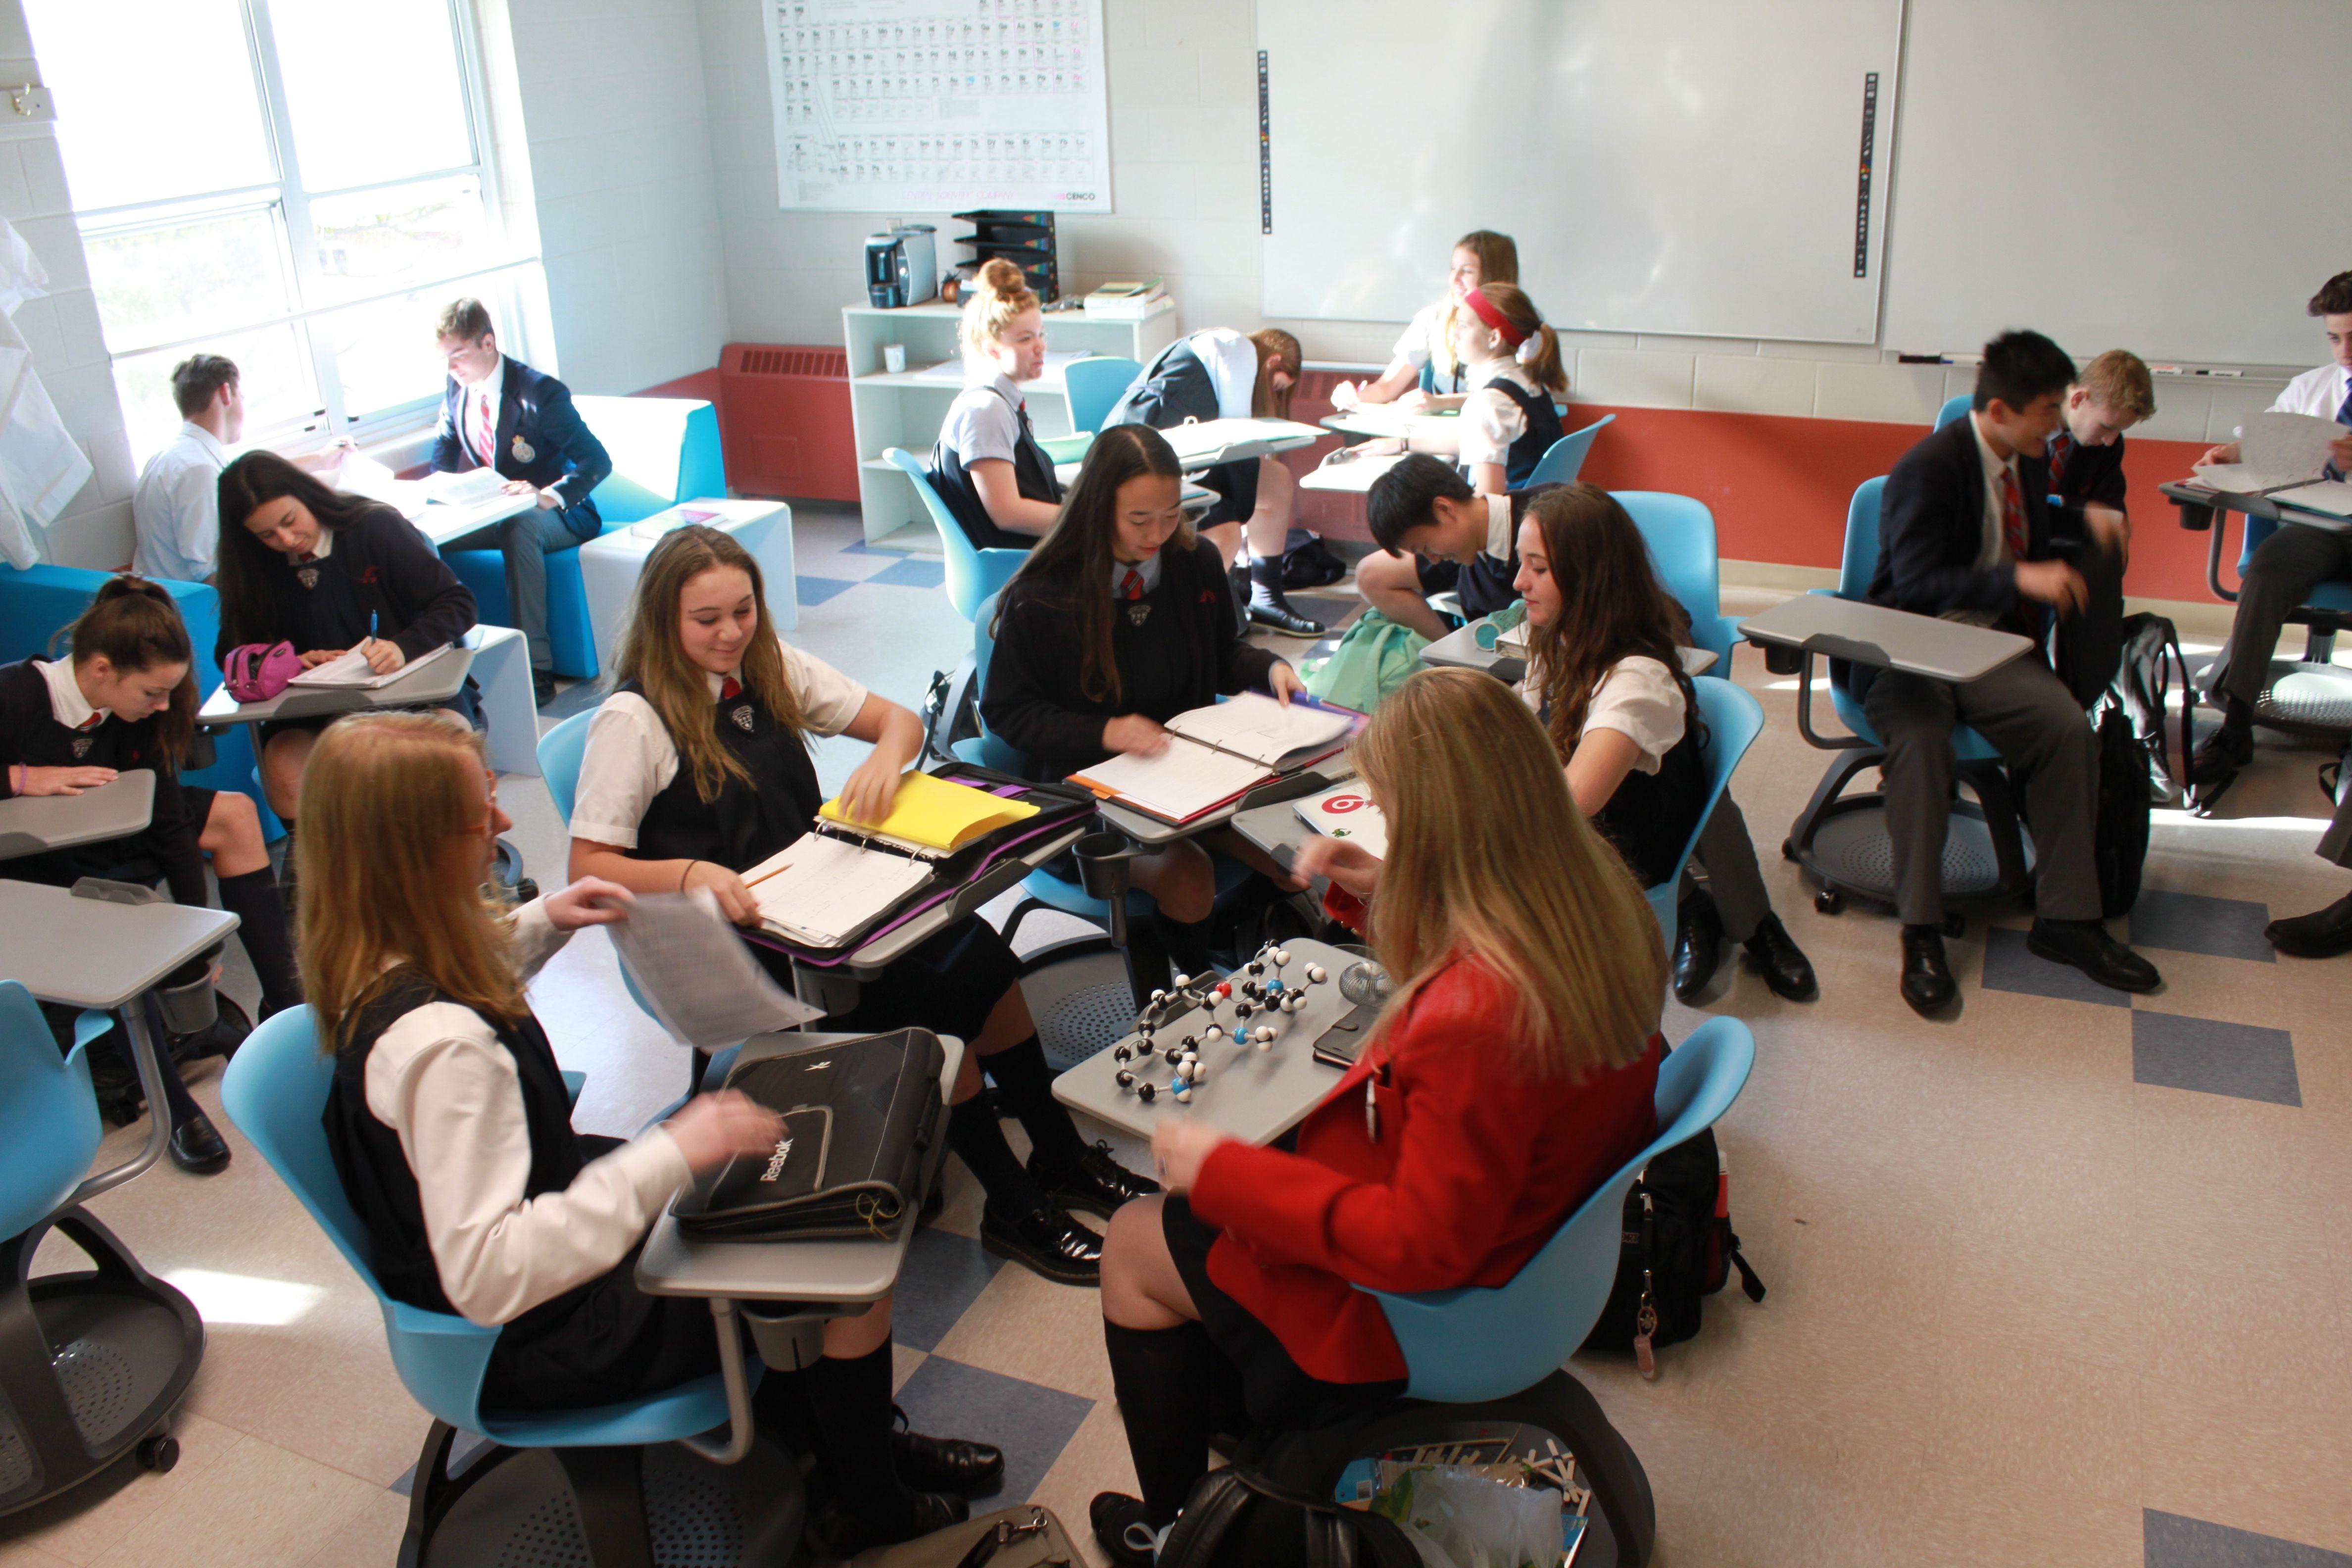 Classroom Pictures - 2322330.jpg